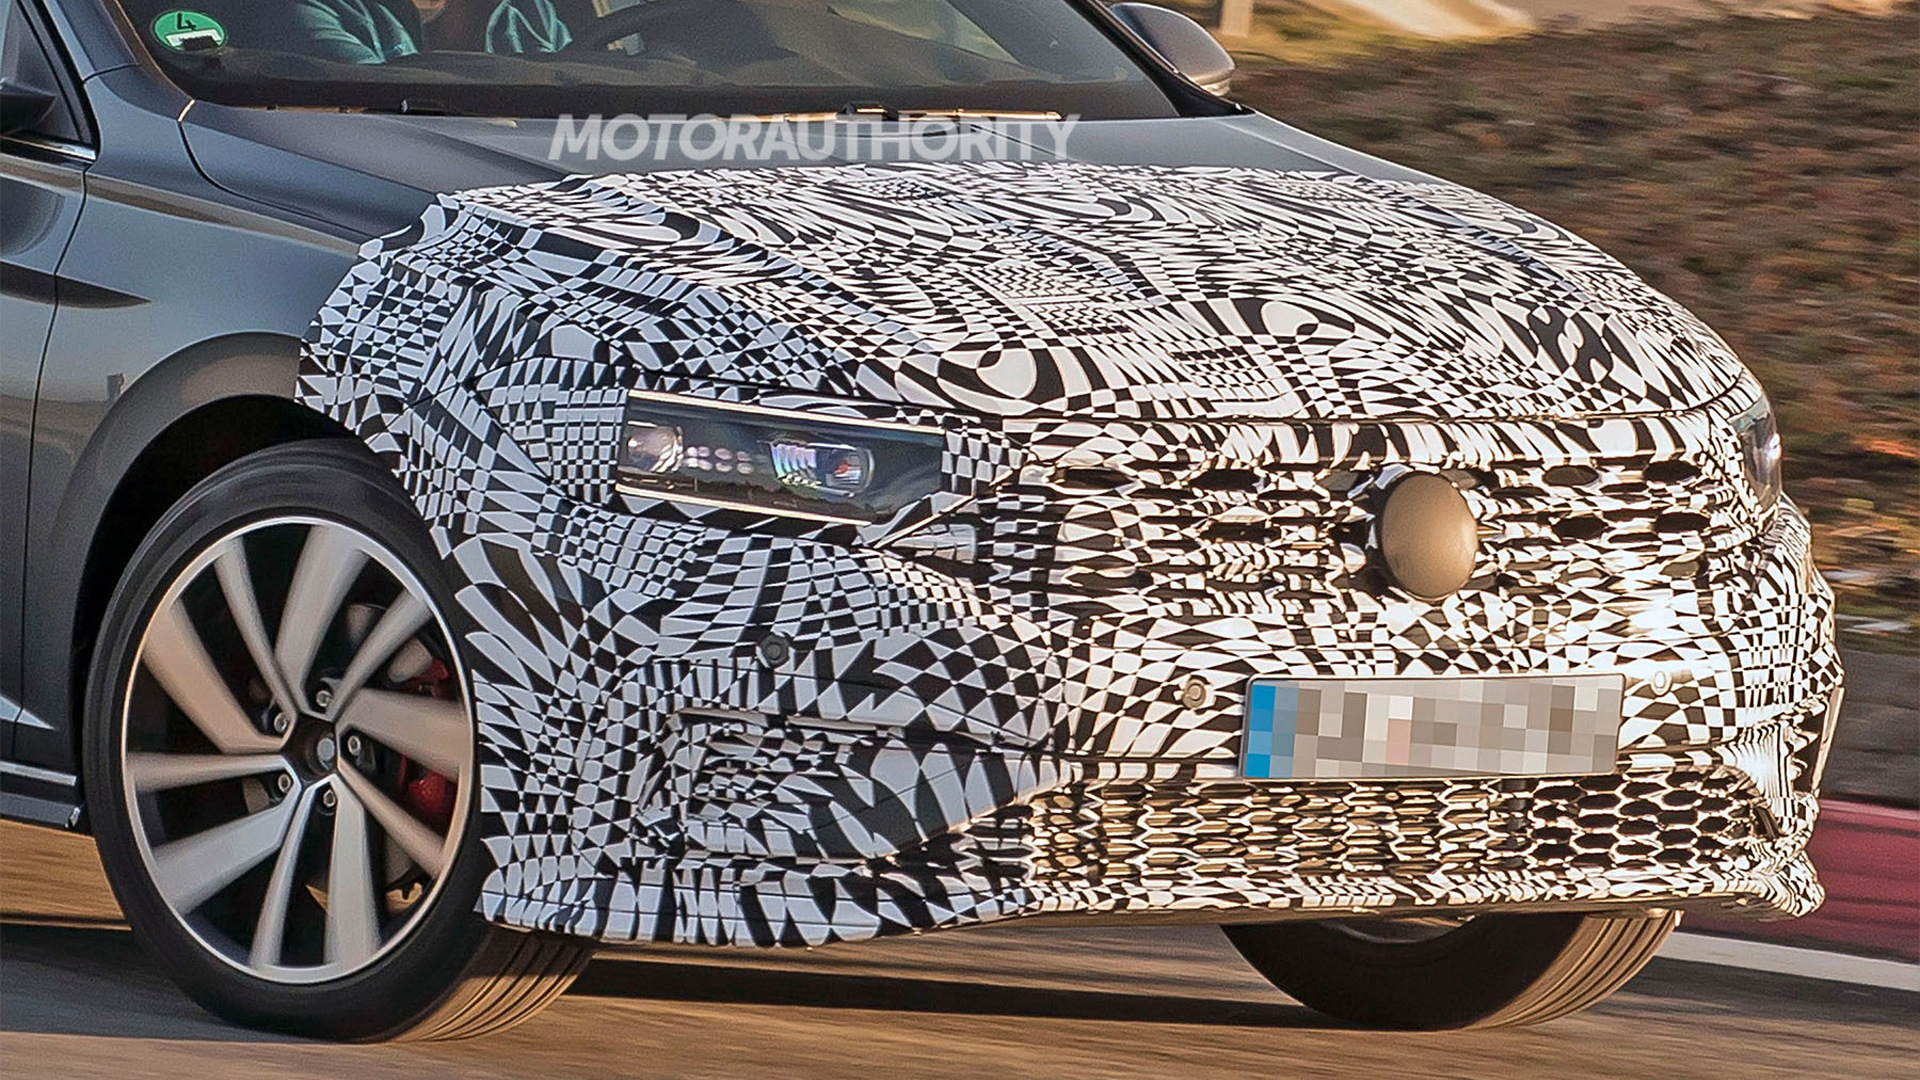 2020 Volkswagen Jetta GLI spy shots - Image via S. Baldauf/SB-Medien